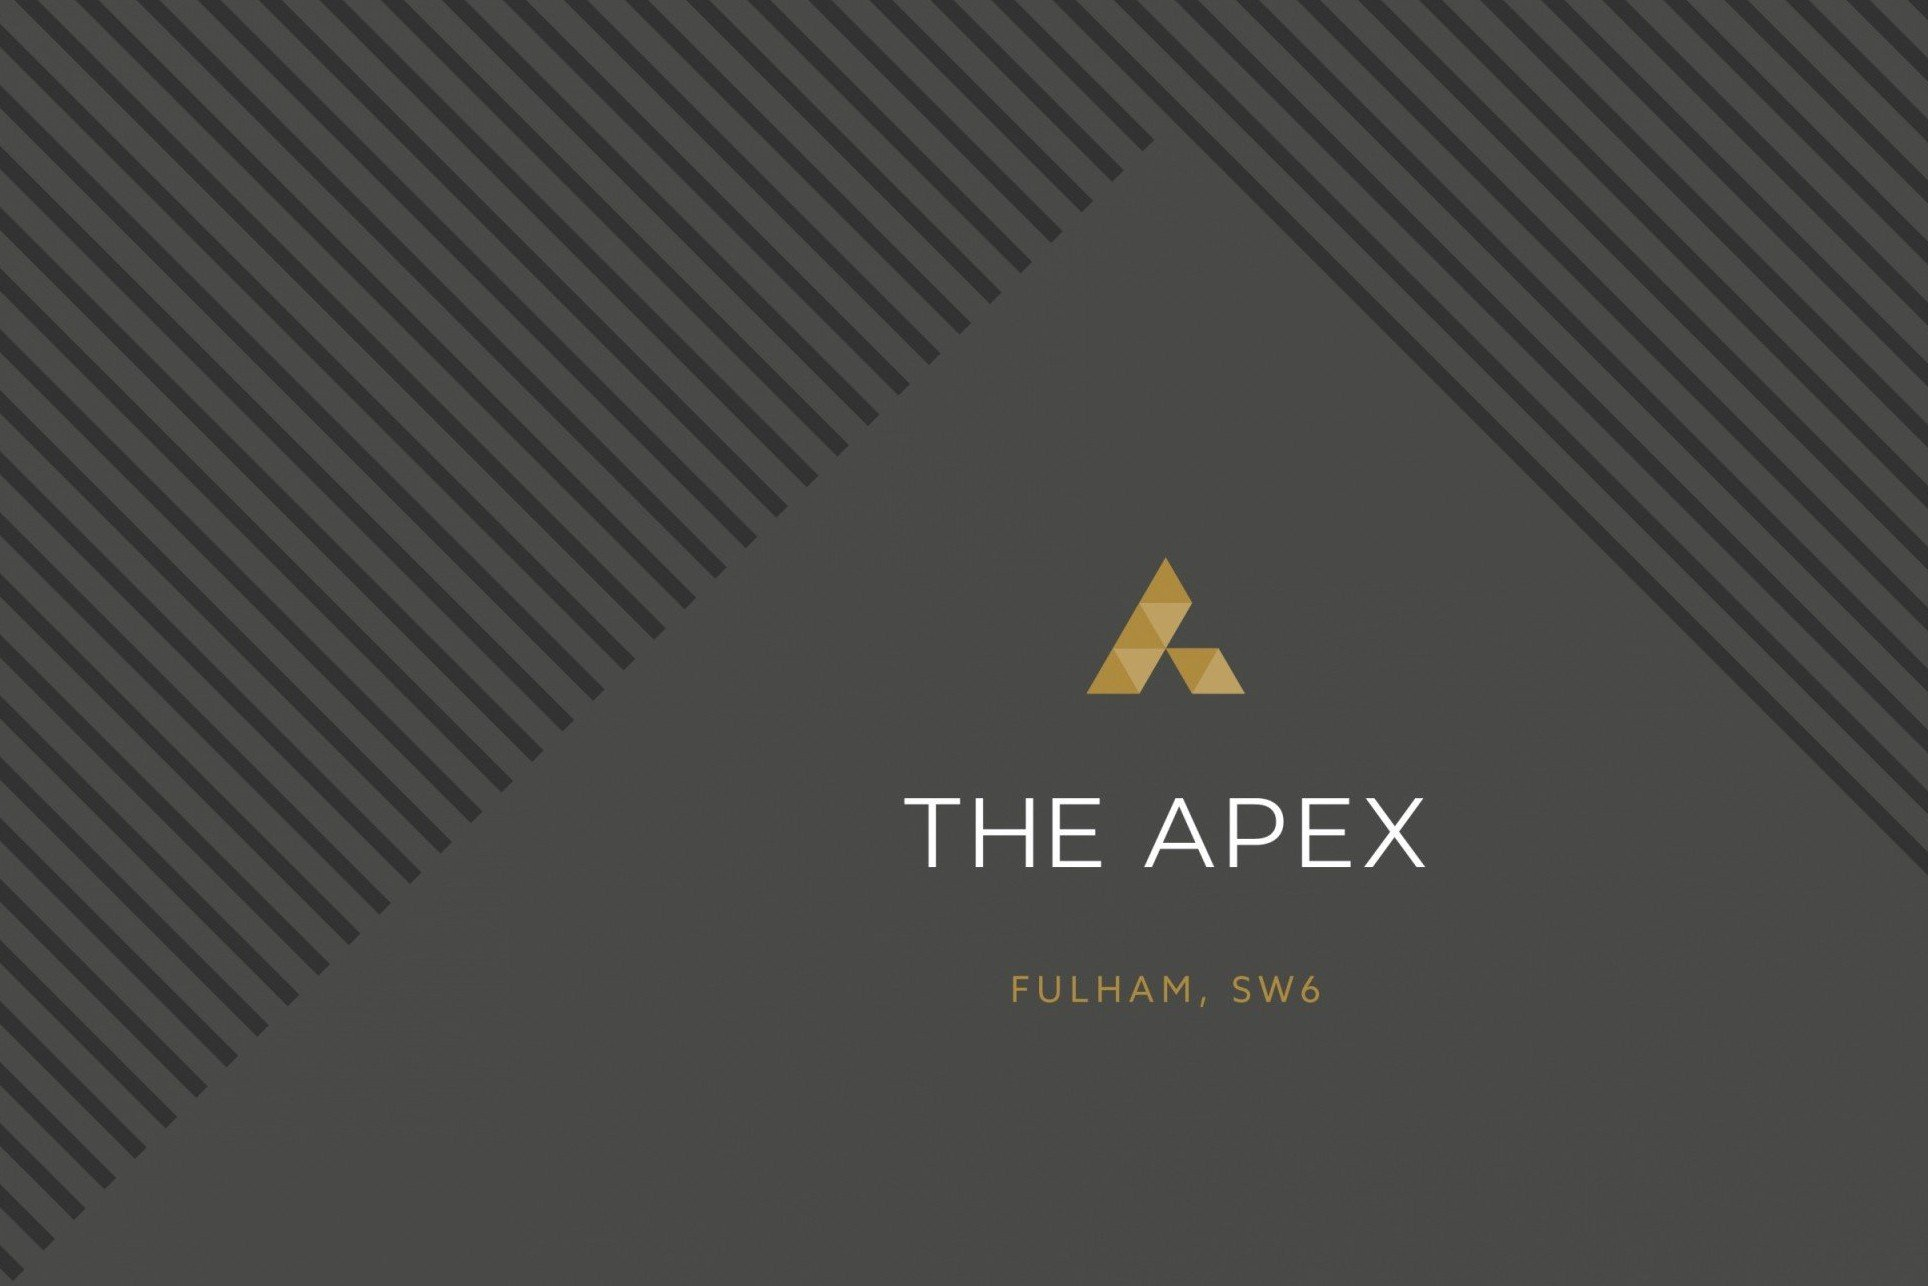 The Apex Tile 001